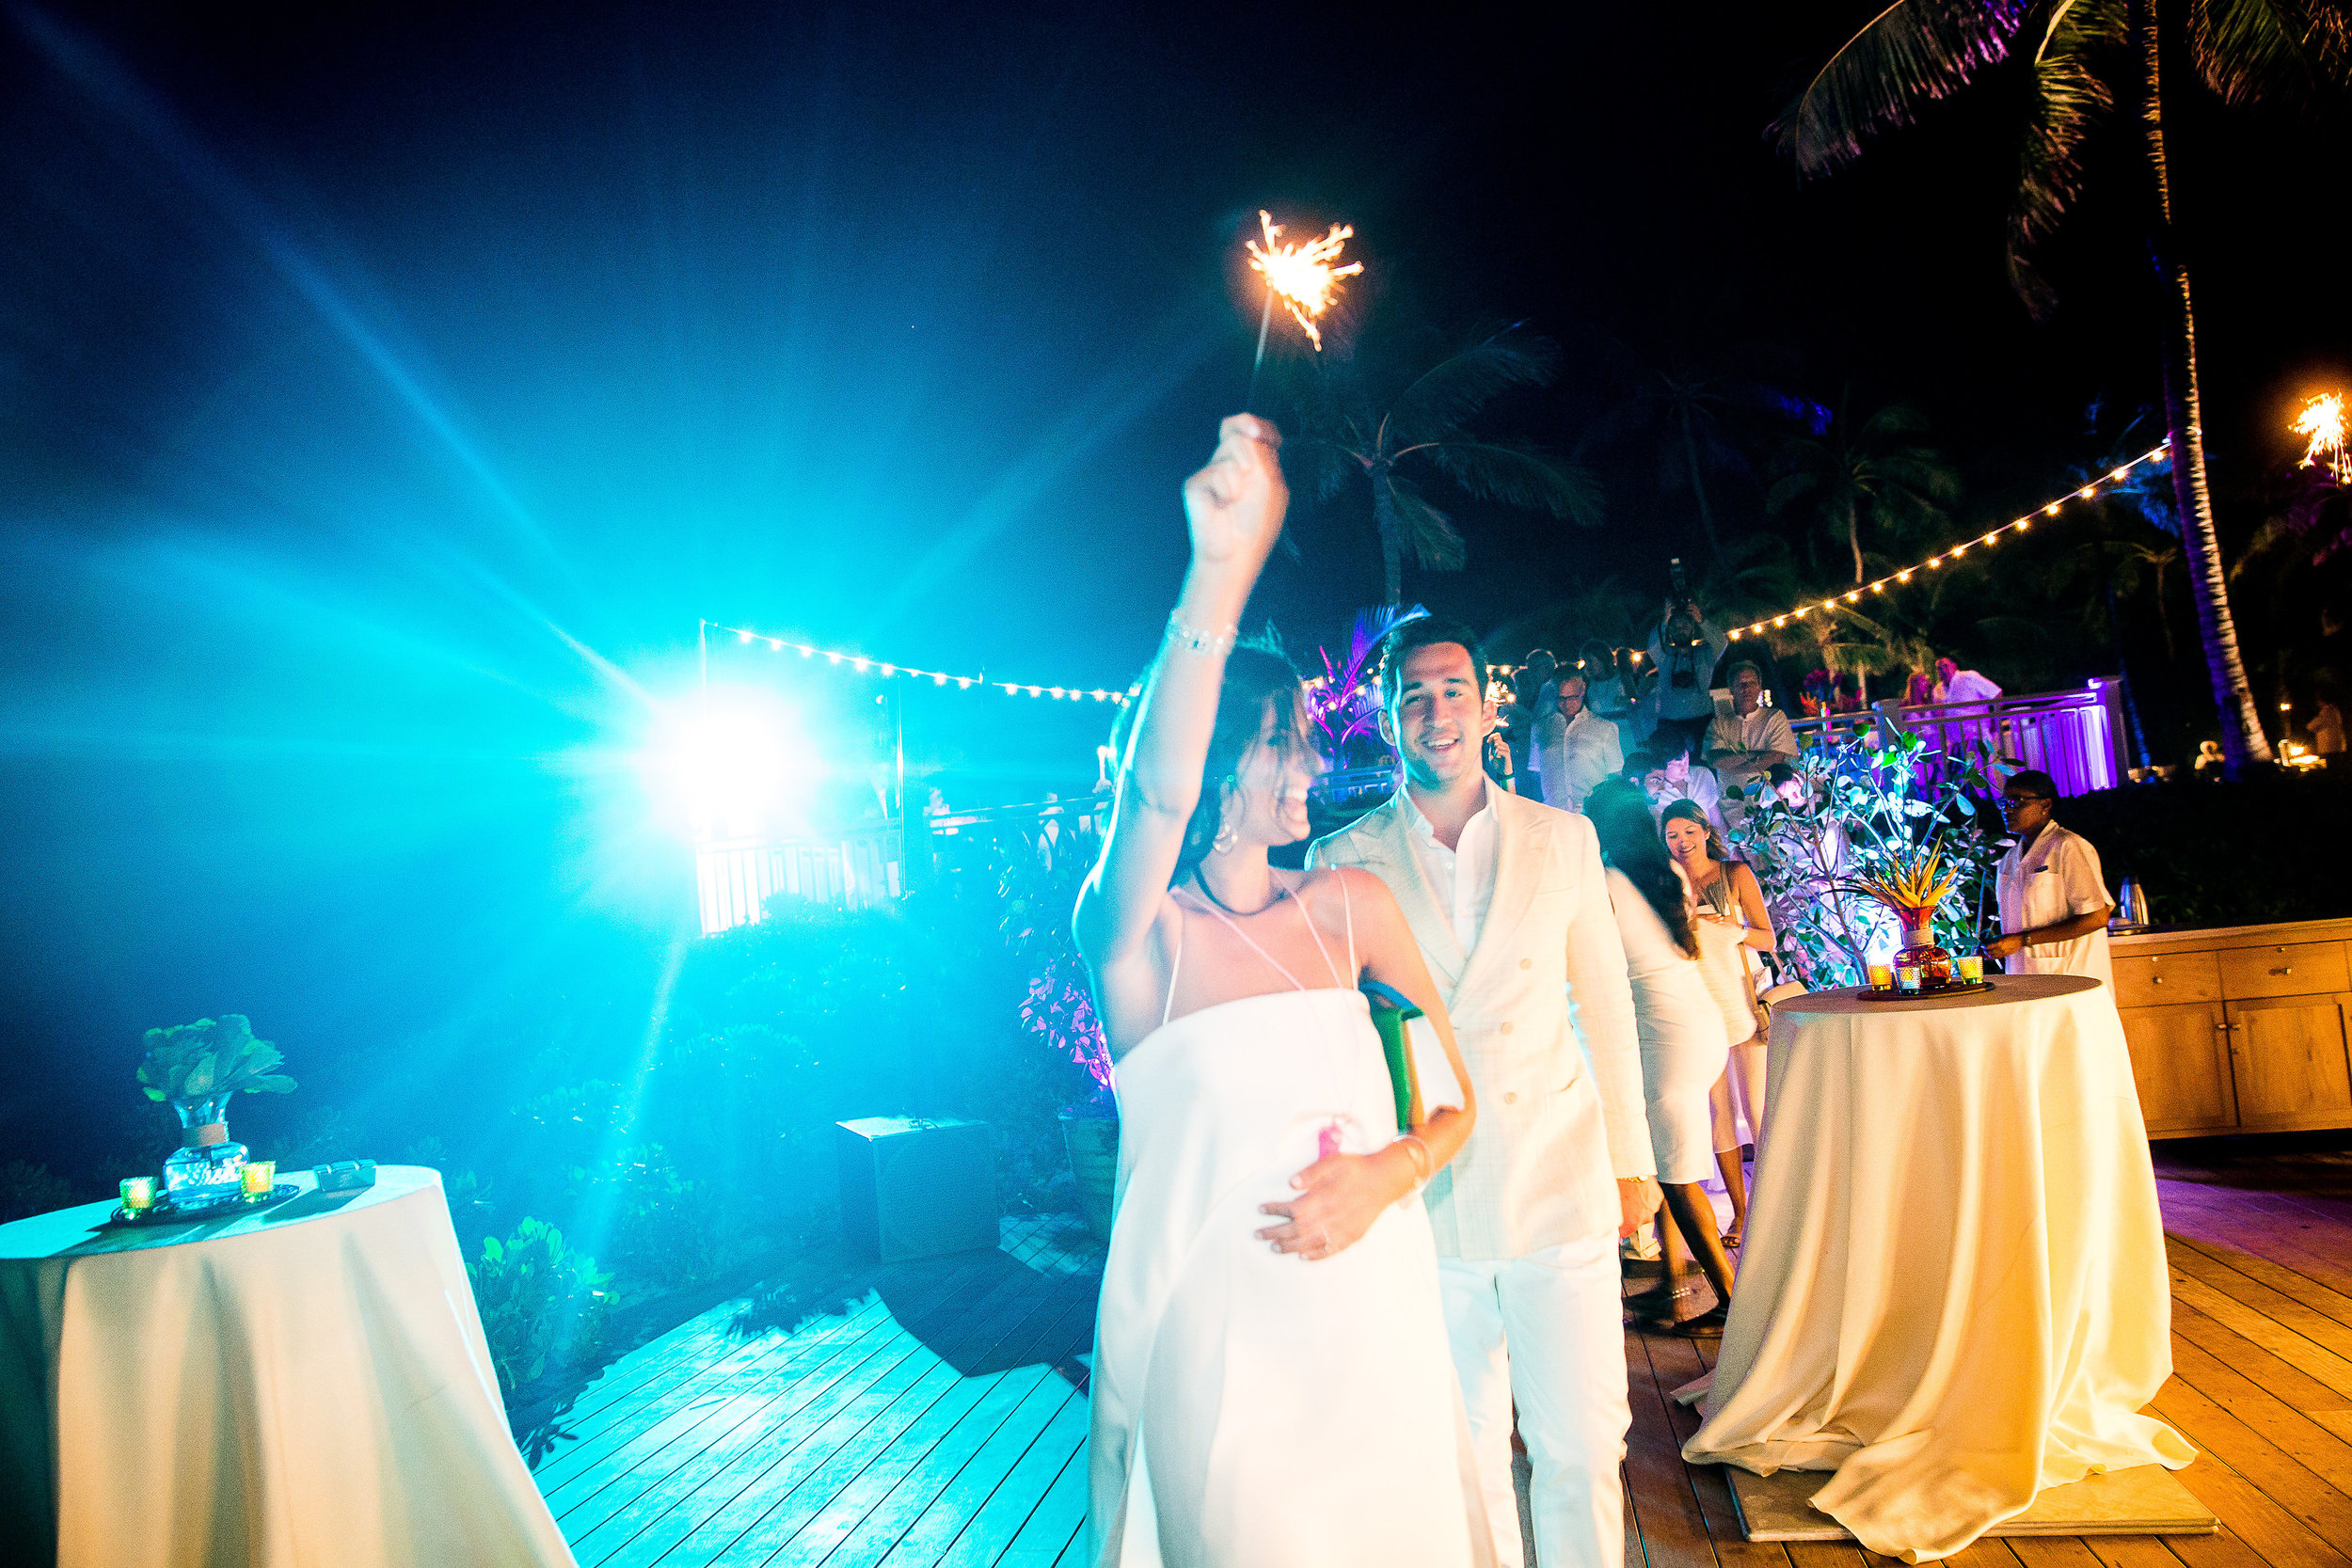 Ceci_New_York_Ceci_Style_Ceci_Johnson_Luxury_Lifestyle_Destination_Bahamas_Wedding_Letterpress_Inspiration_Design_Custom_Couture_Personalized_Invitations_49.jpg